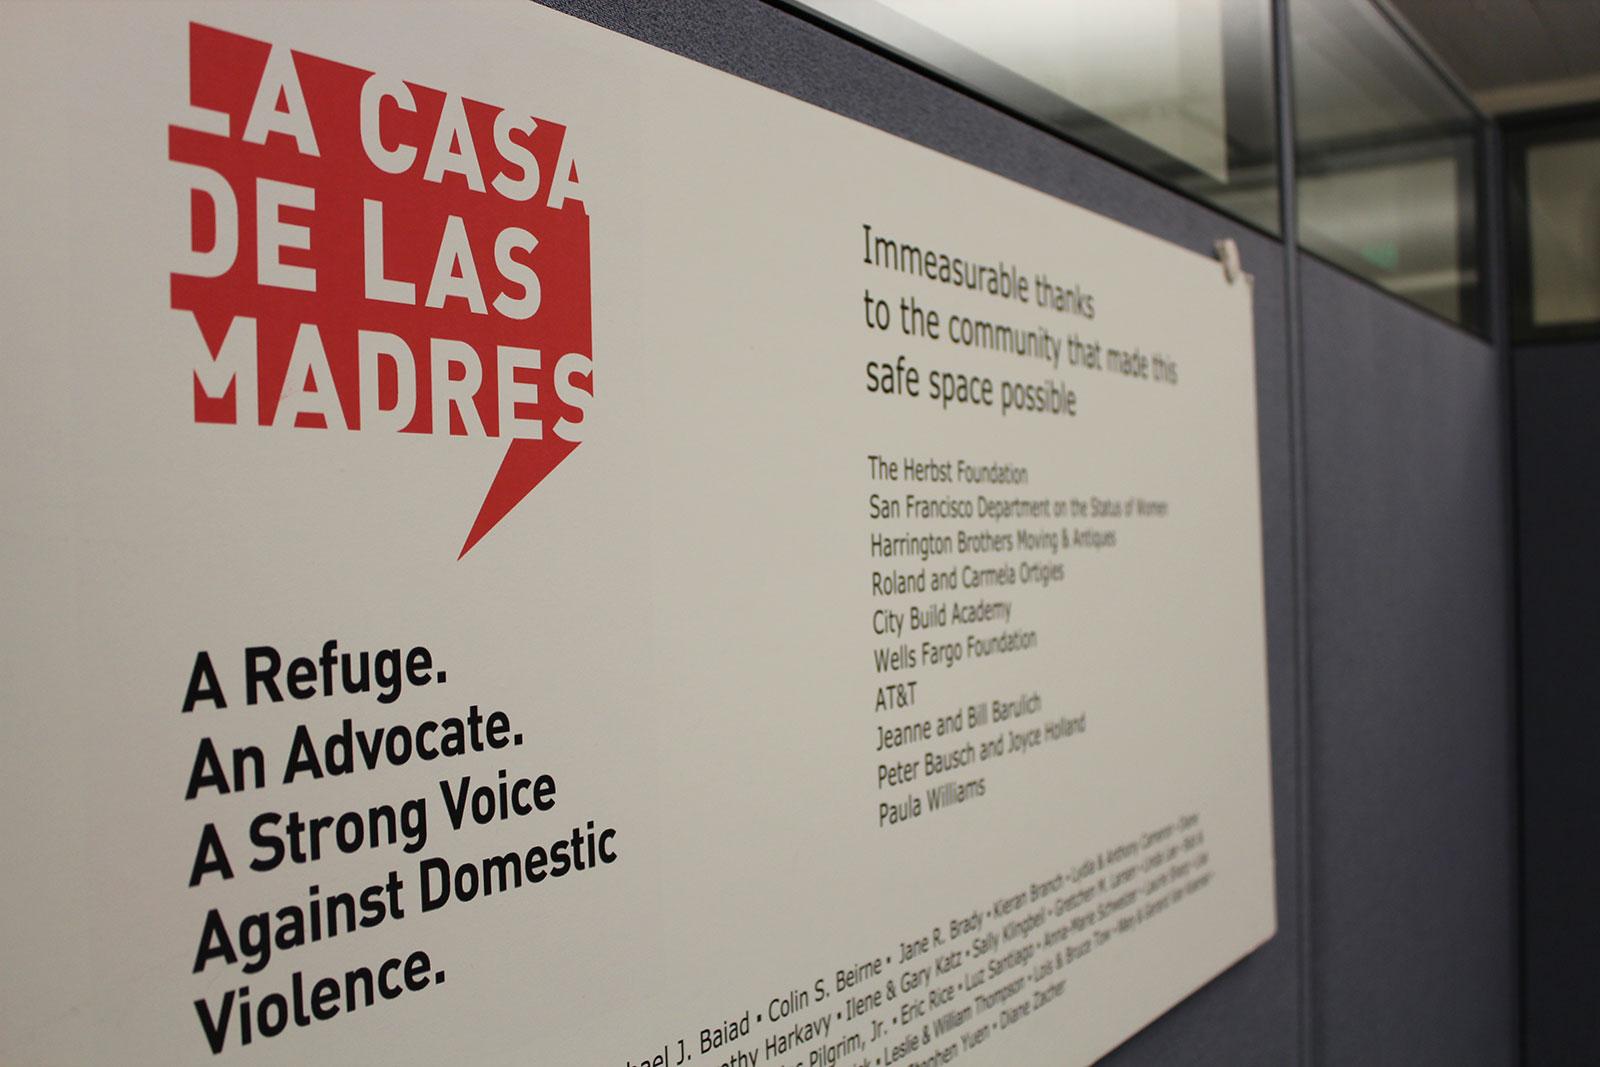 Giving Thanks: Advocating for Women at La Casa de las Madres